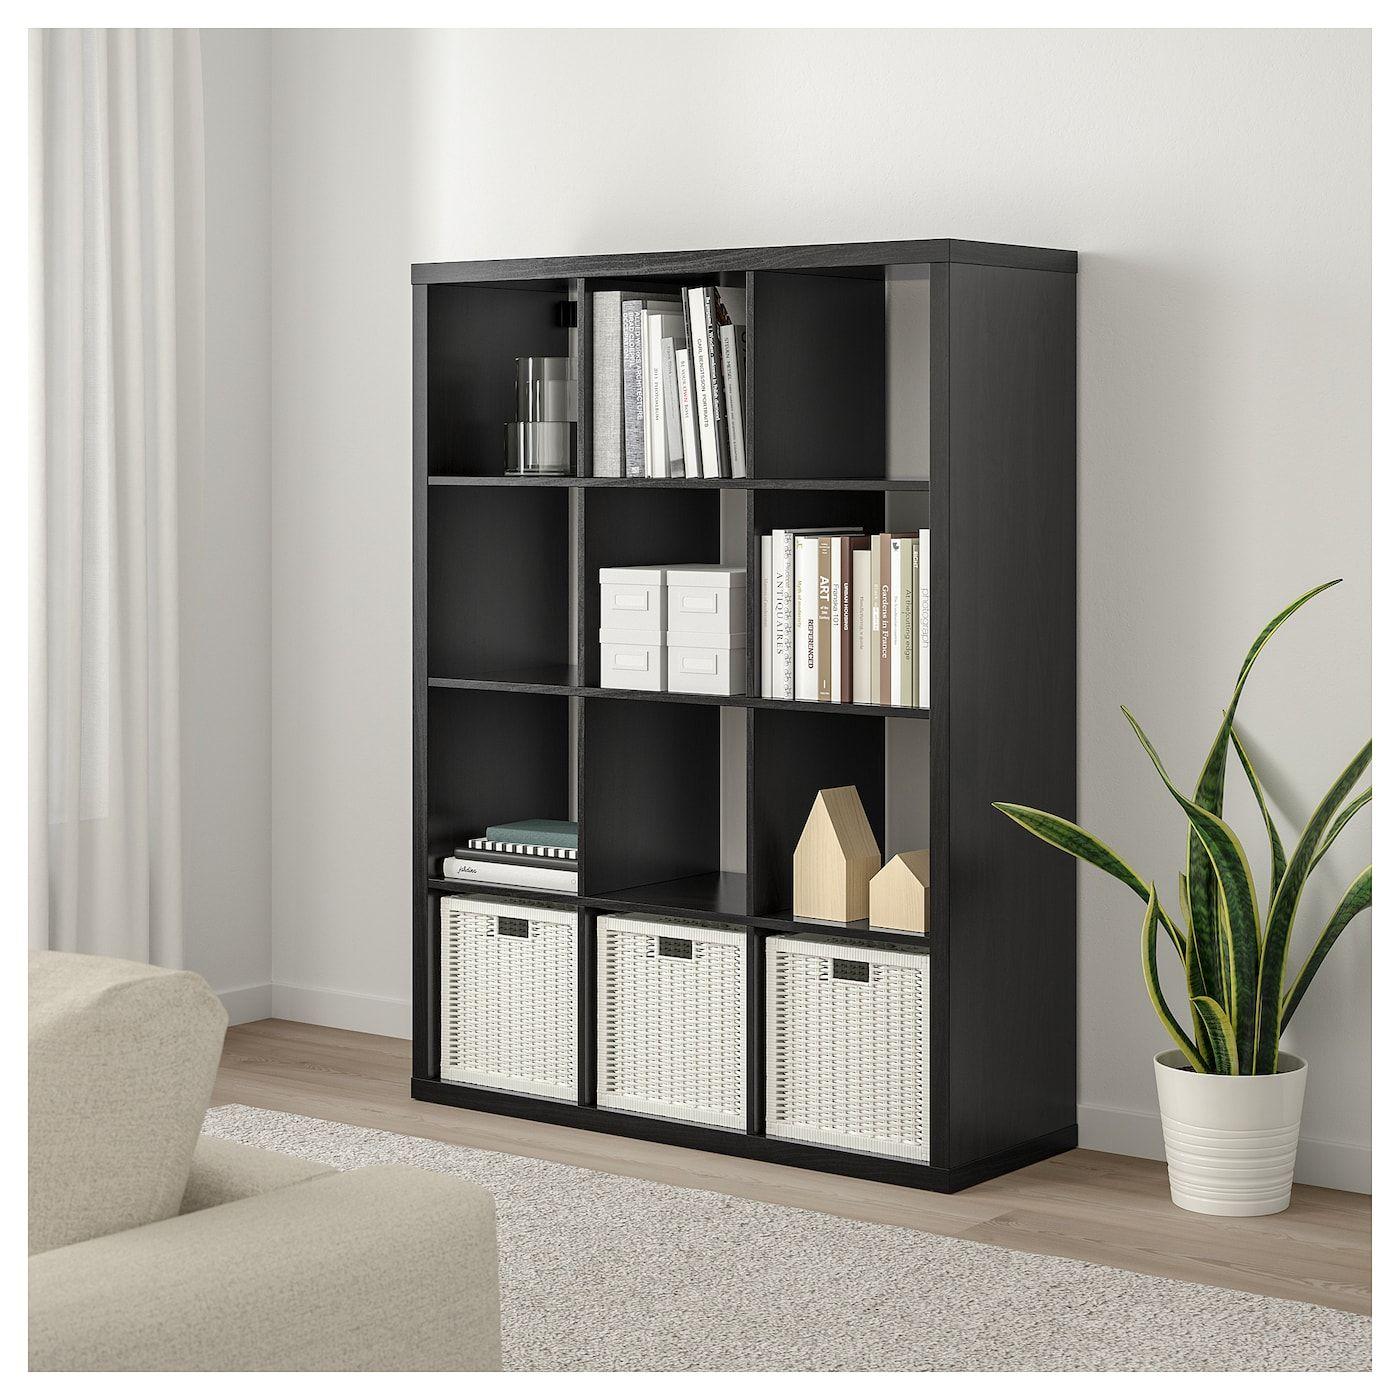 Kallax Shelf Unit Black Brown 44 1 8x57 7 8 With Images